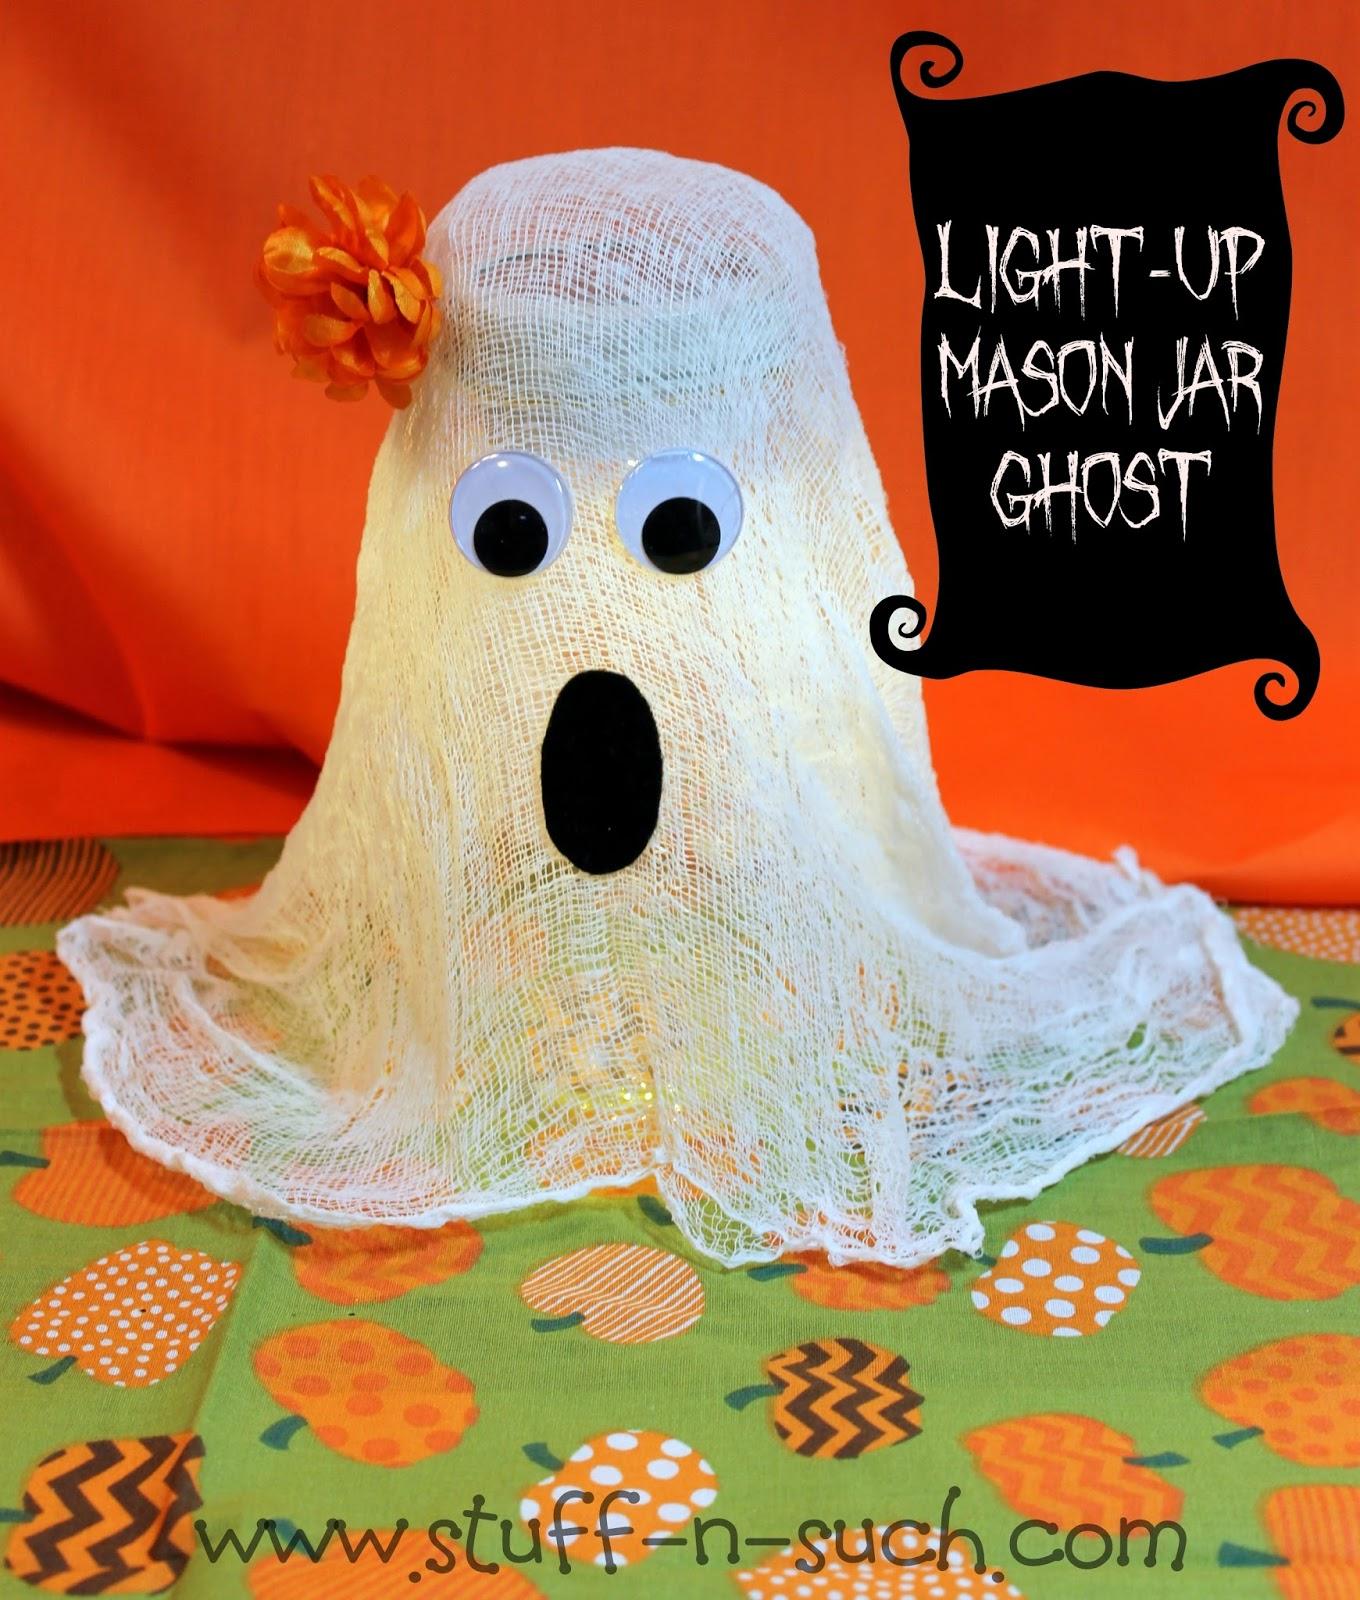 stuff-n-suchlisa: halloween mason jar light-up ghost